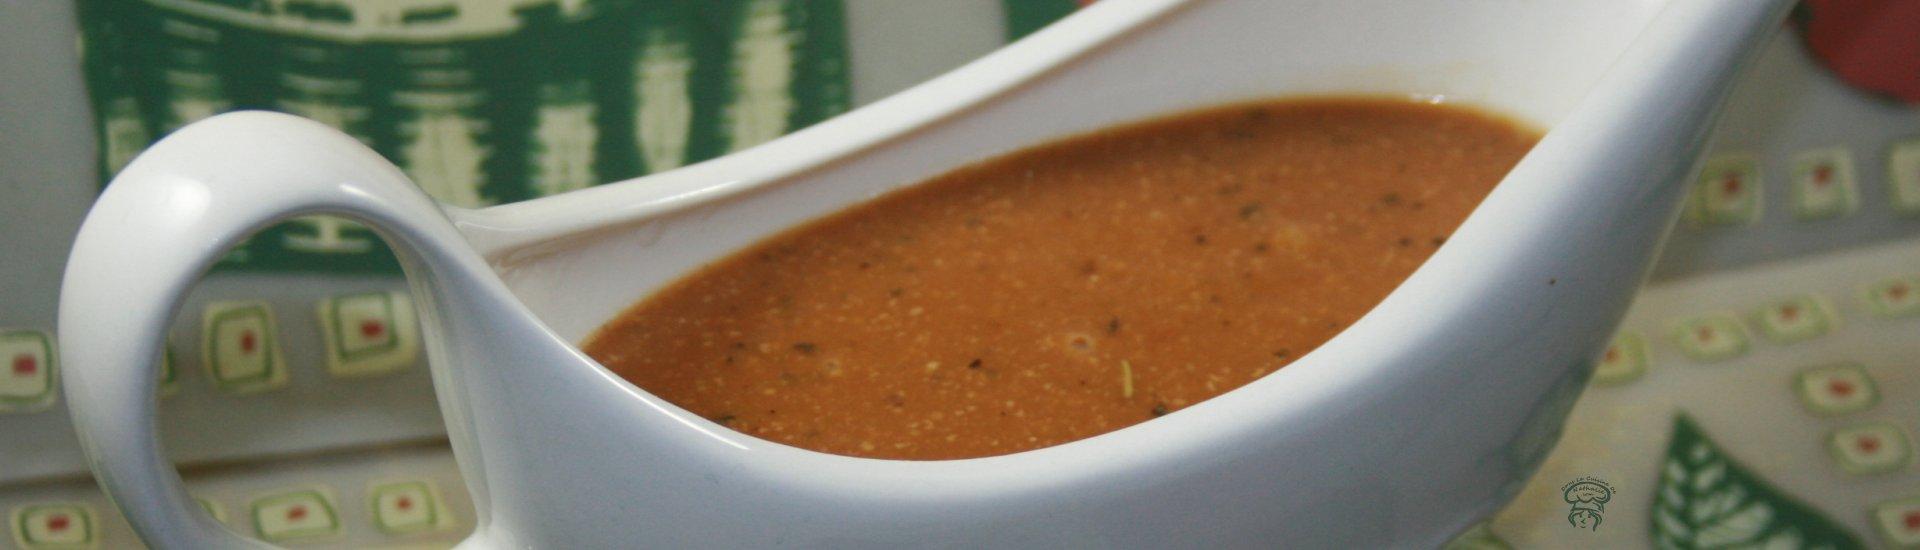 Sauce brune